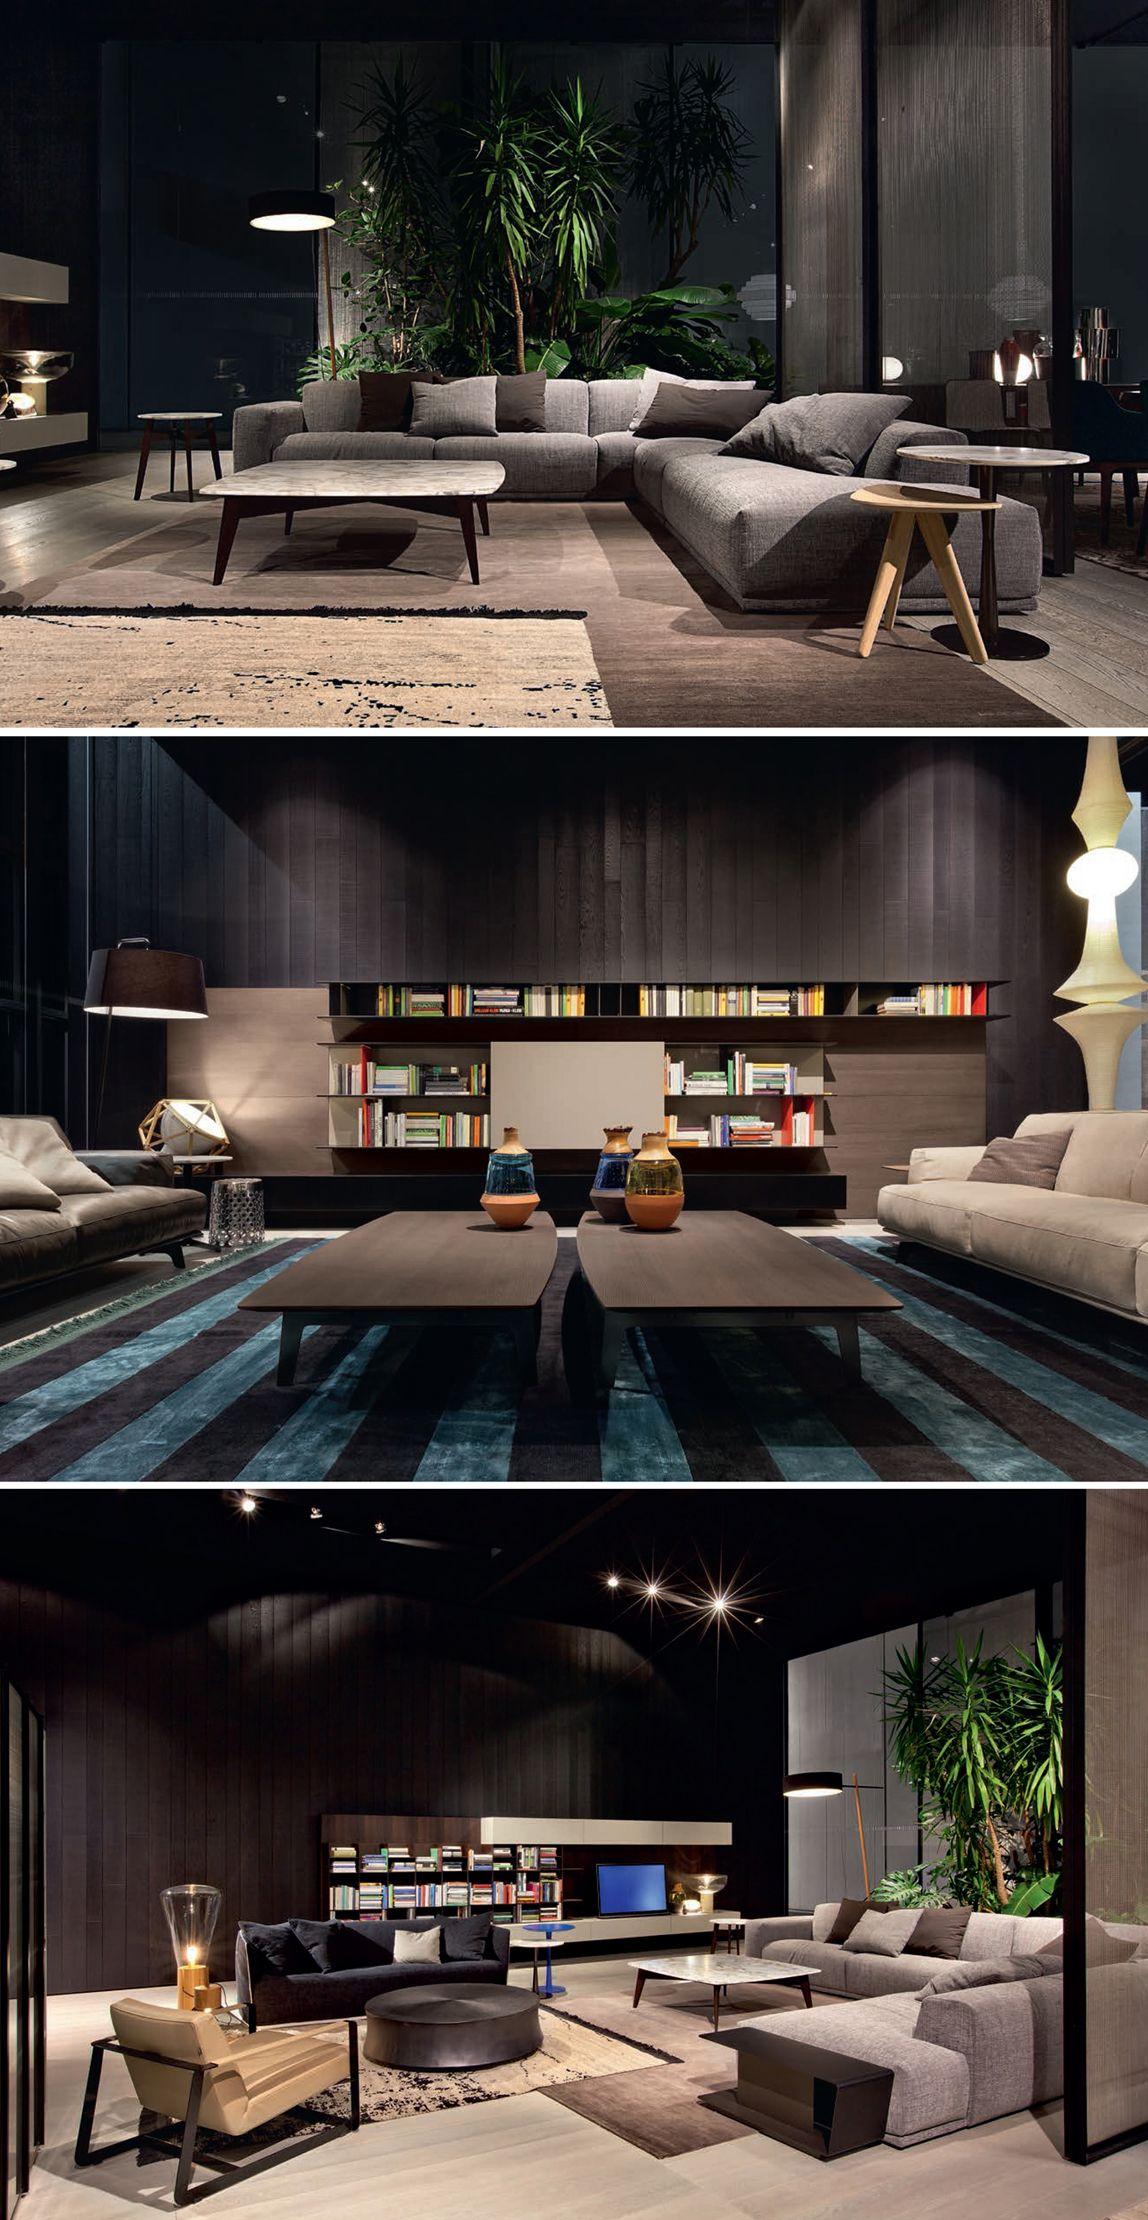 Pin By Gorgi Jurukovski On Living Aesthetics Tyle Interior Architecture House Interior House Design Showroom living room ideas